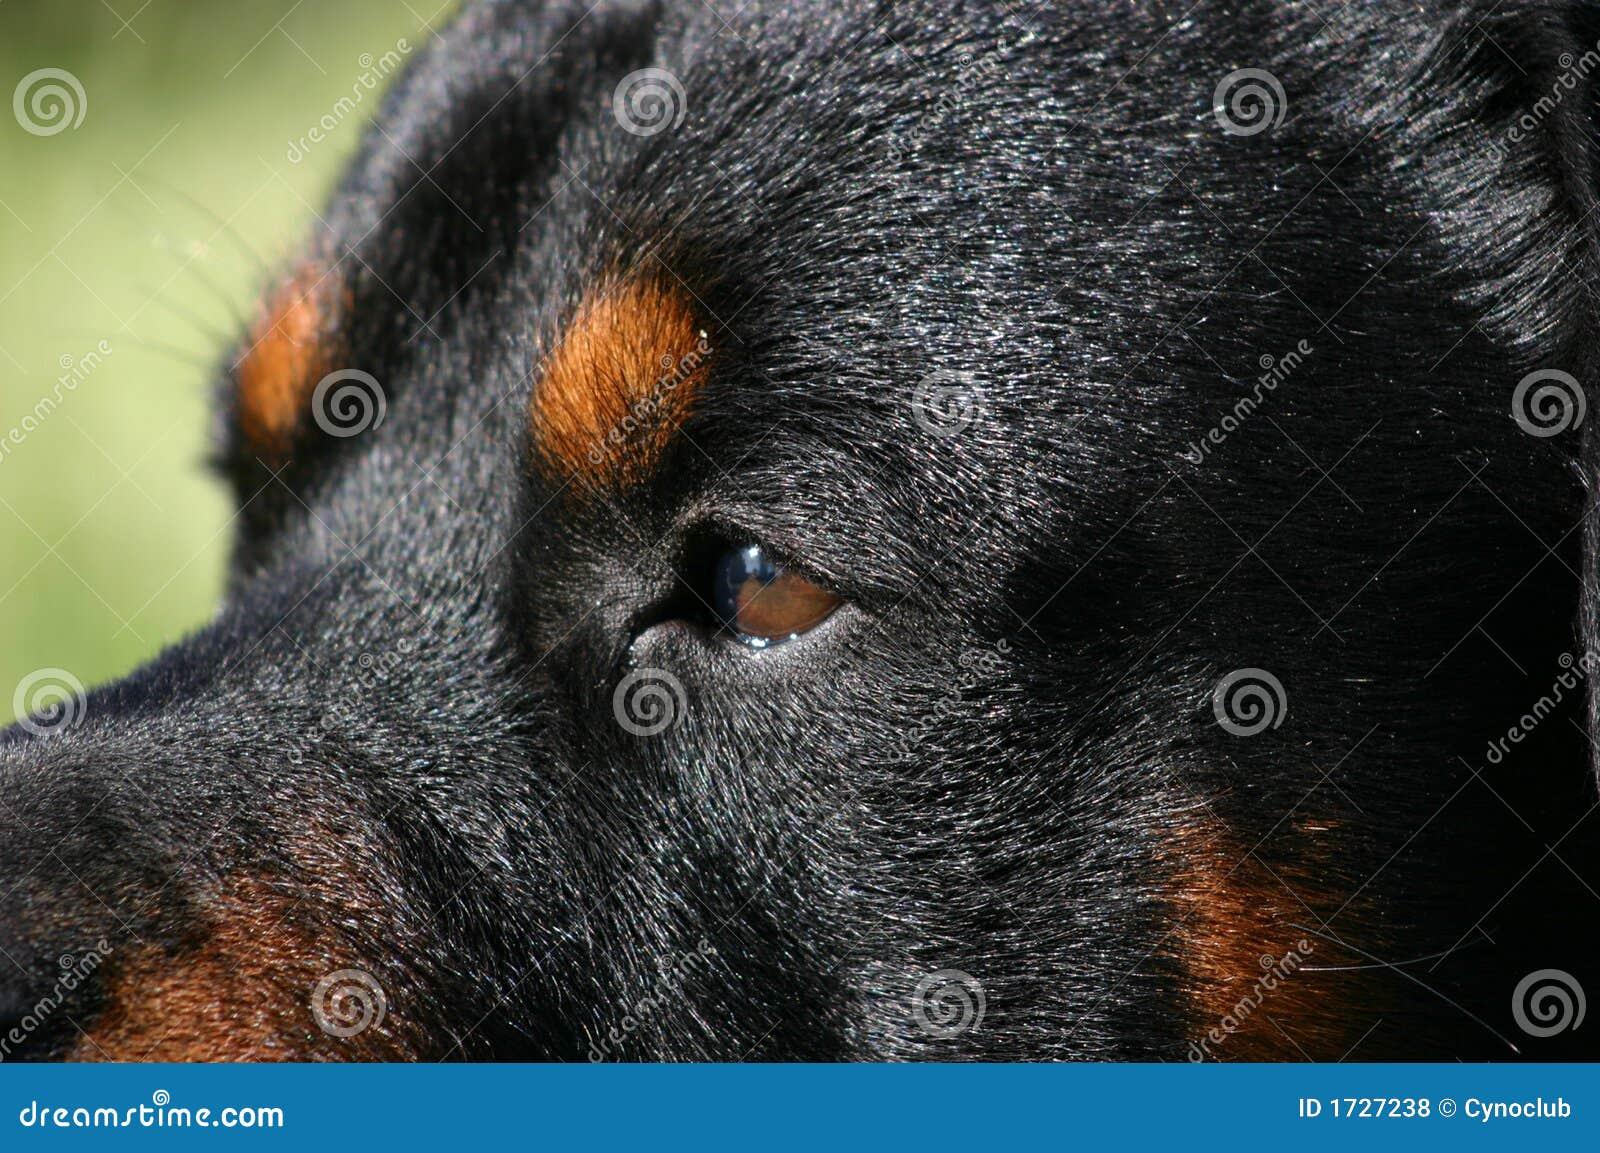 eyes of rottweiler royalty free stock photos